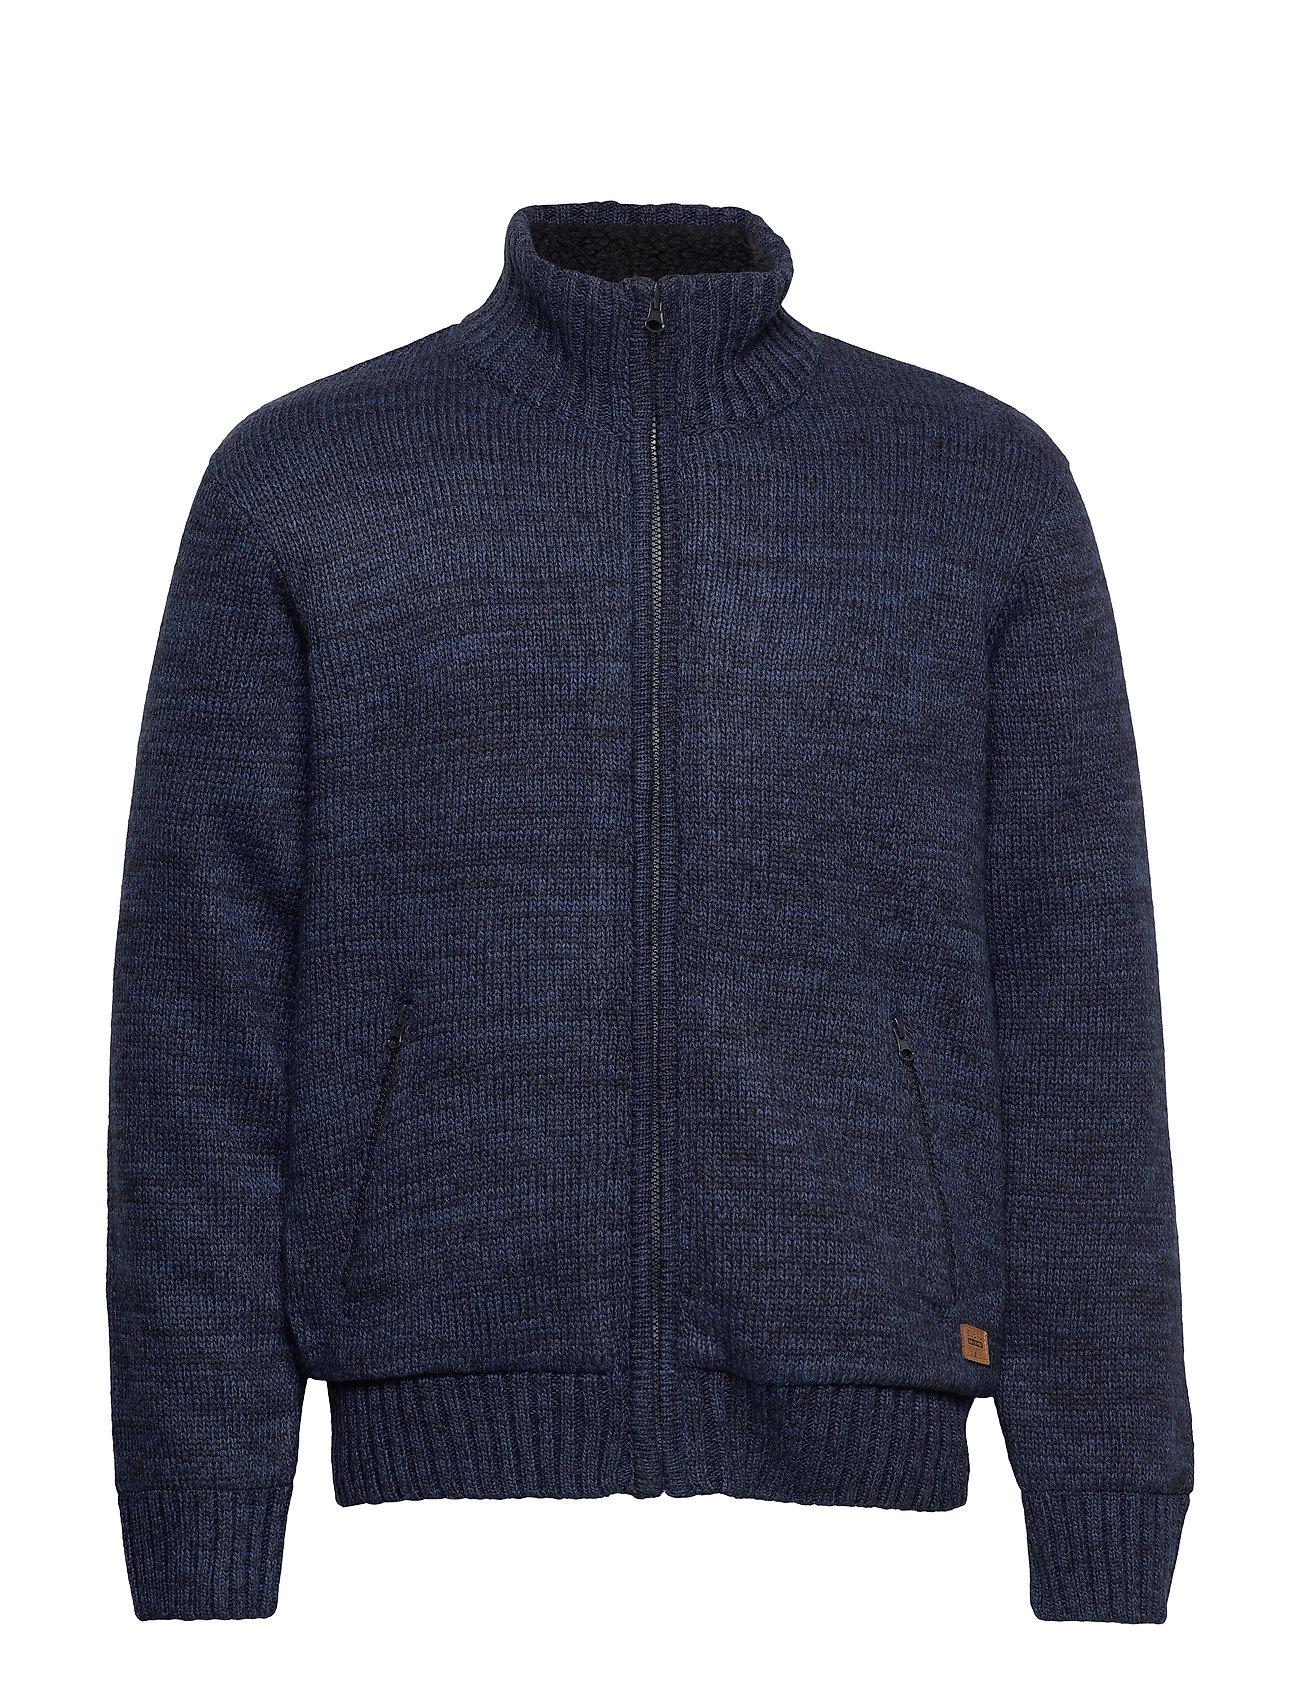 Blend Pullover - DARK NAVY BLUE